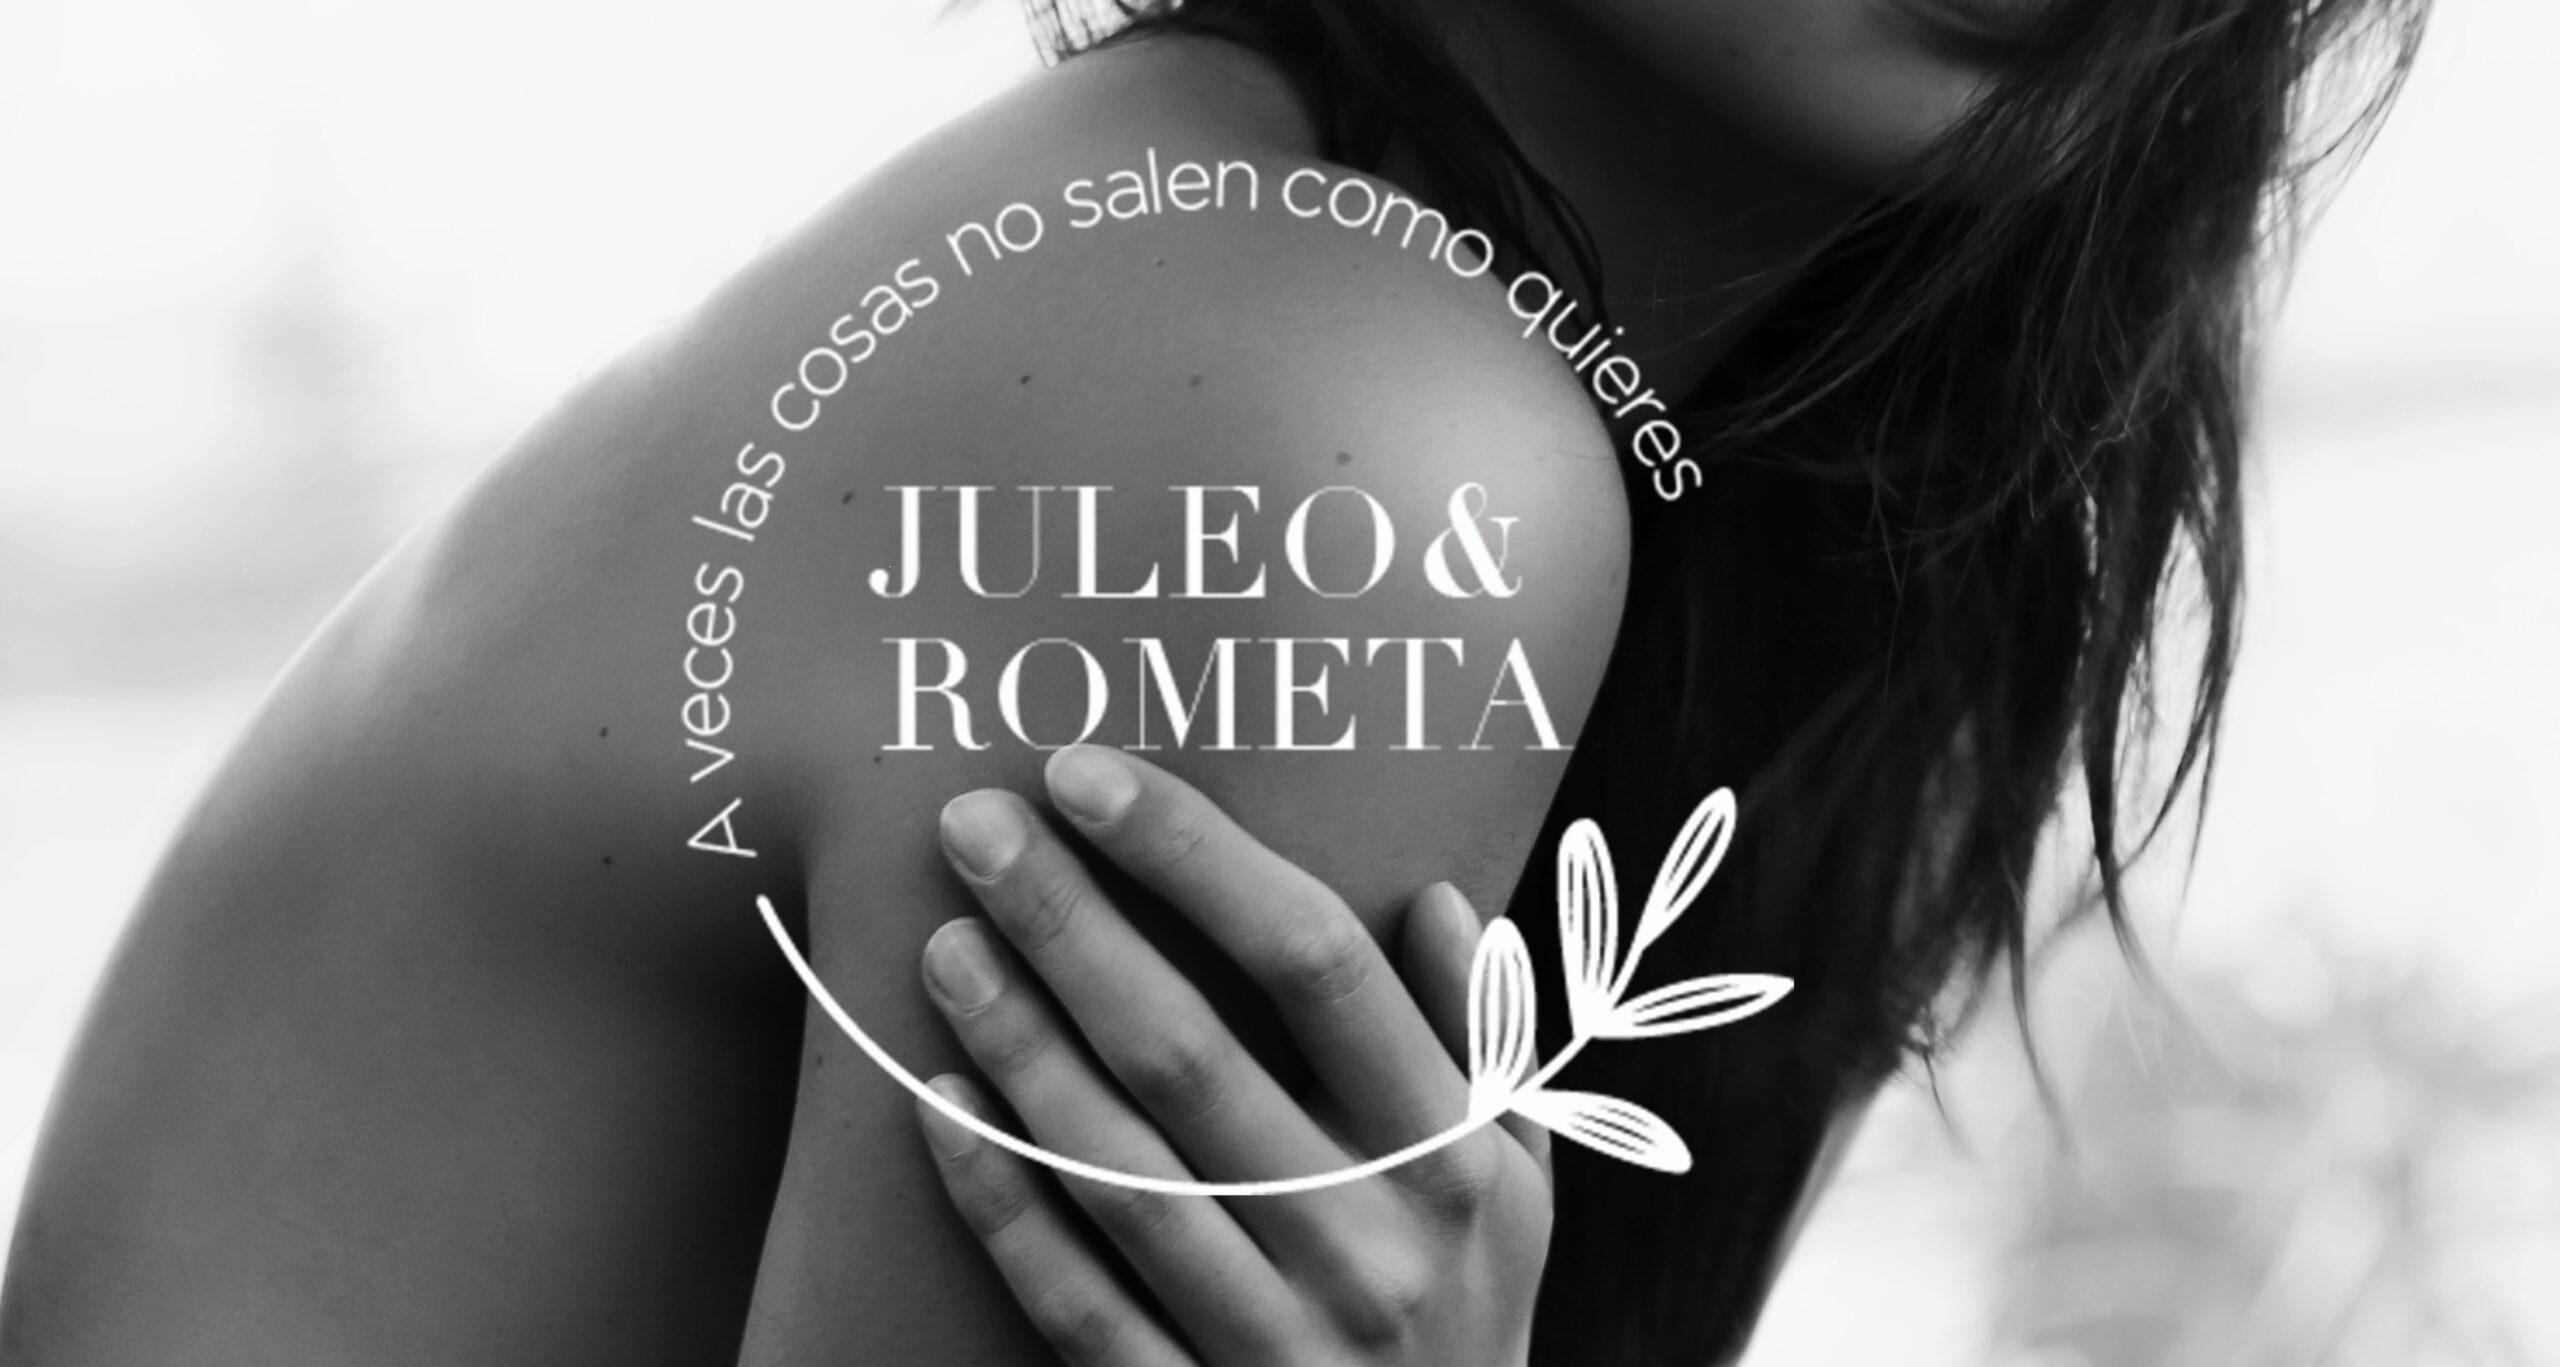 JULEO & ROMETA